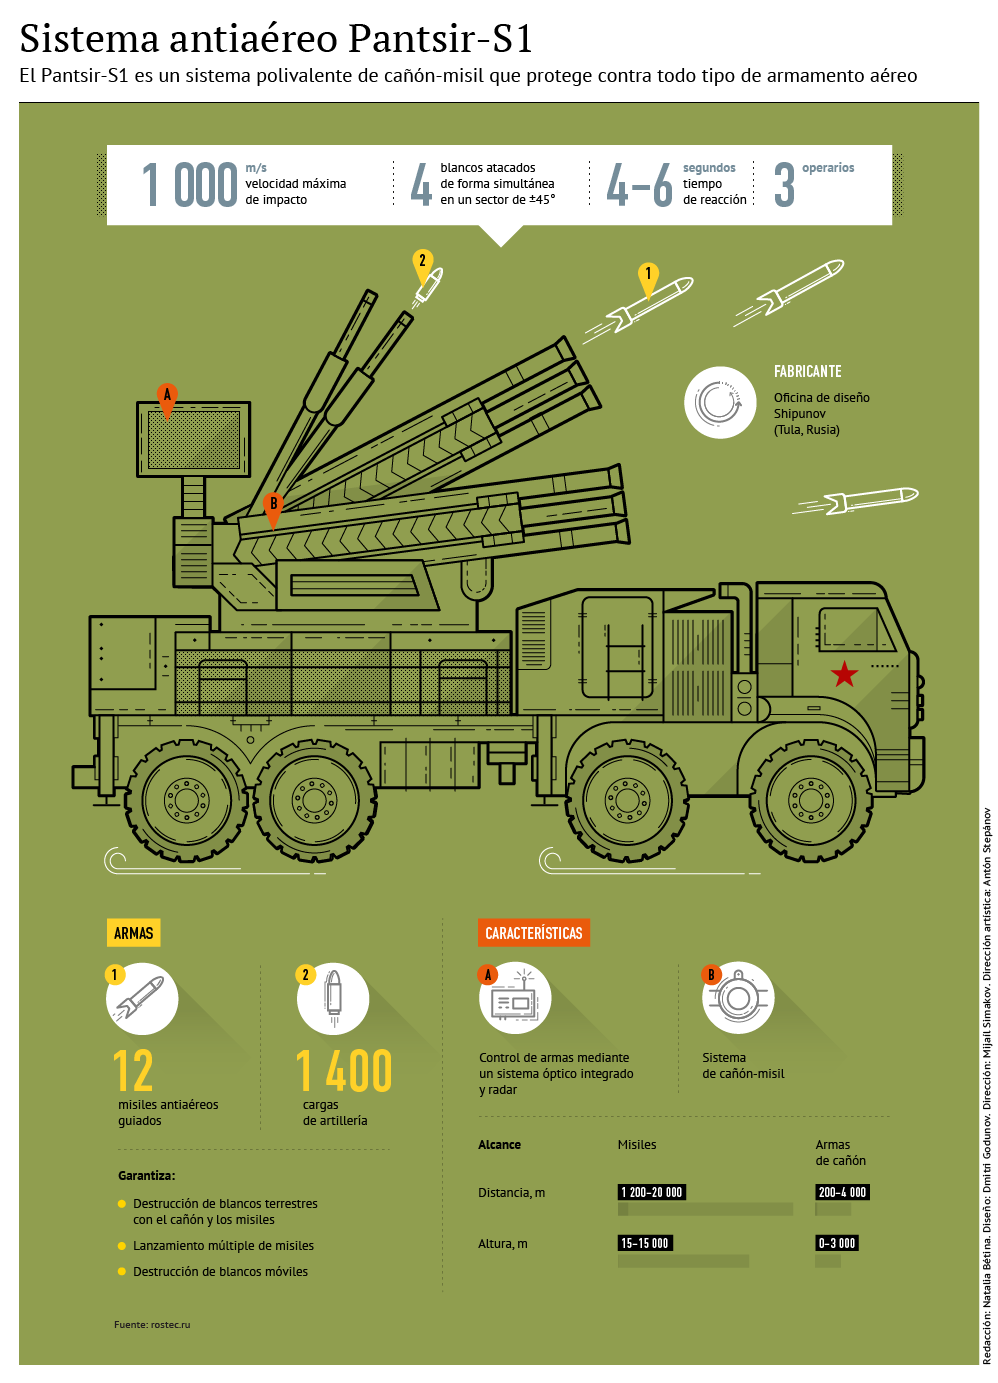 Sistema antiaéreo Pantsir-S1 - Sputnik Mundo